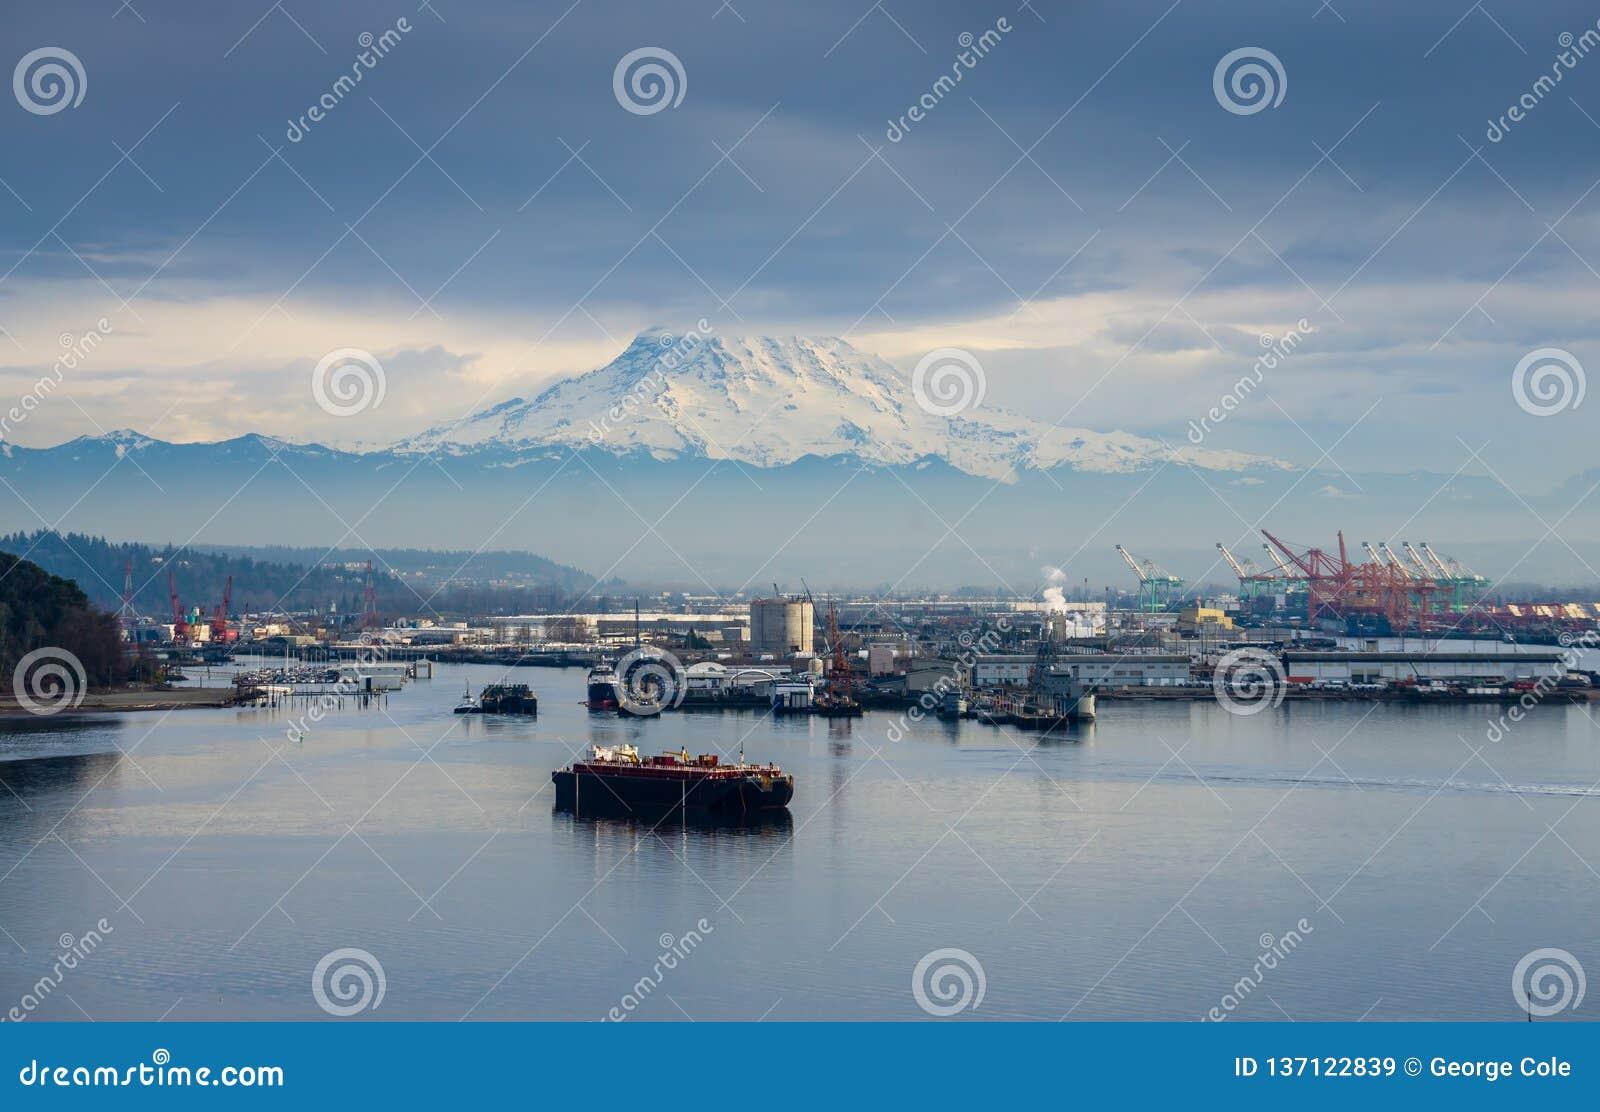 Port Under Mount Rainier royalty free stock images